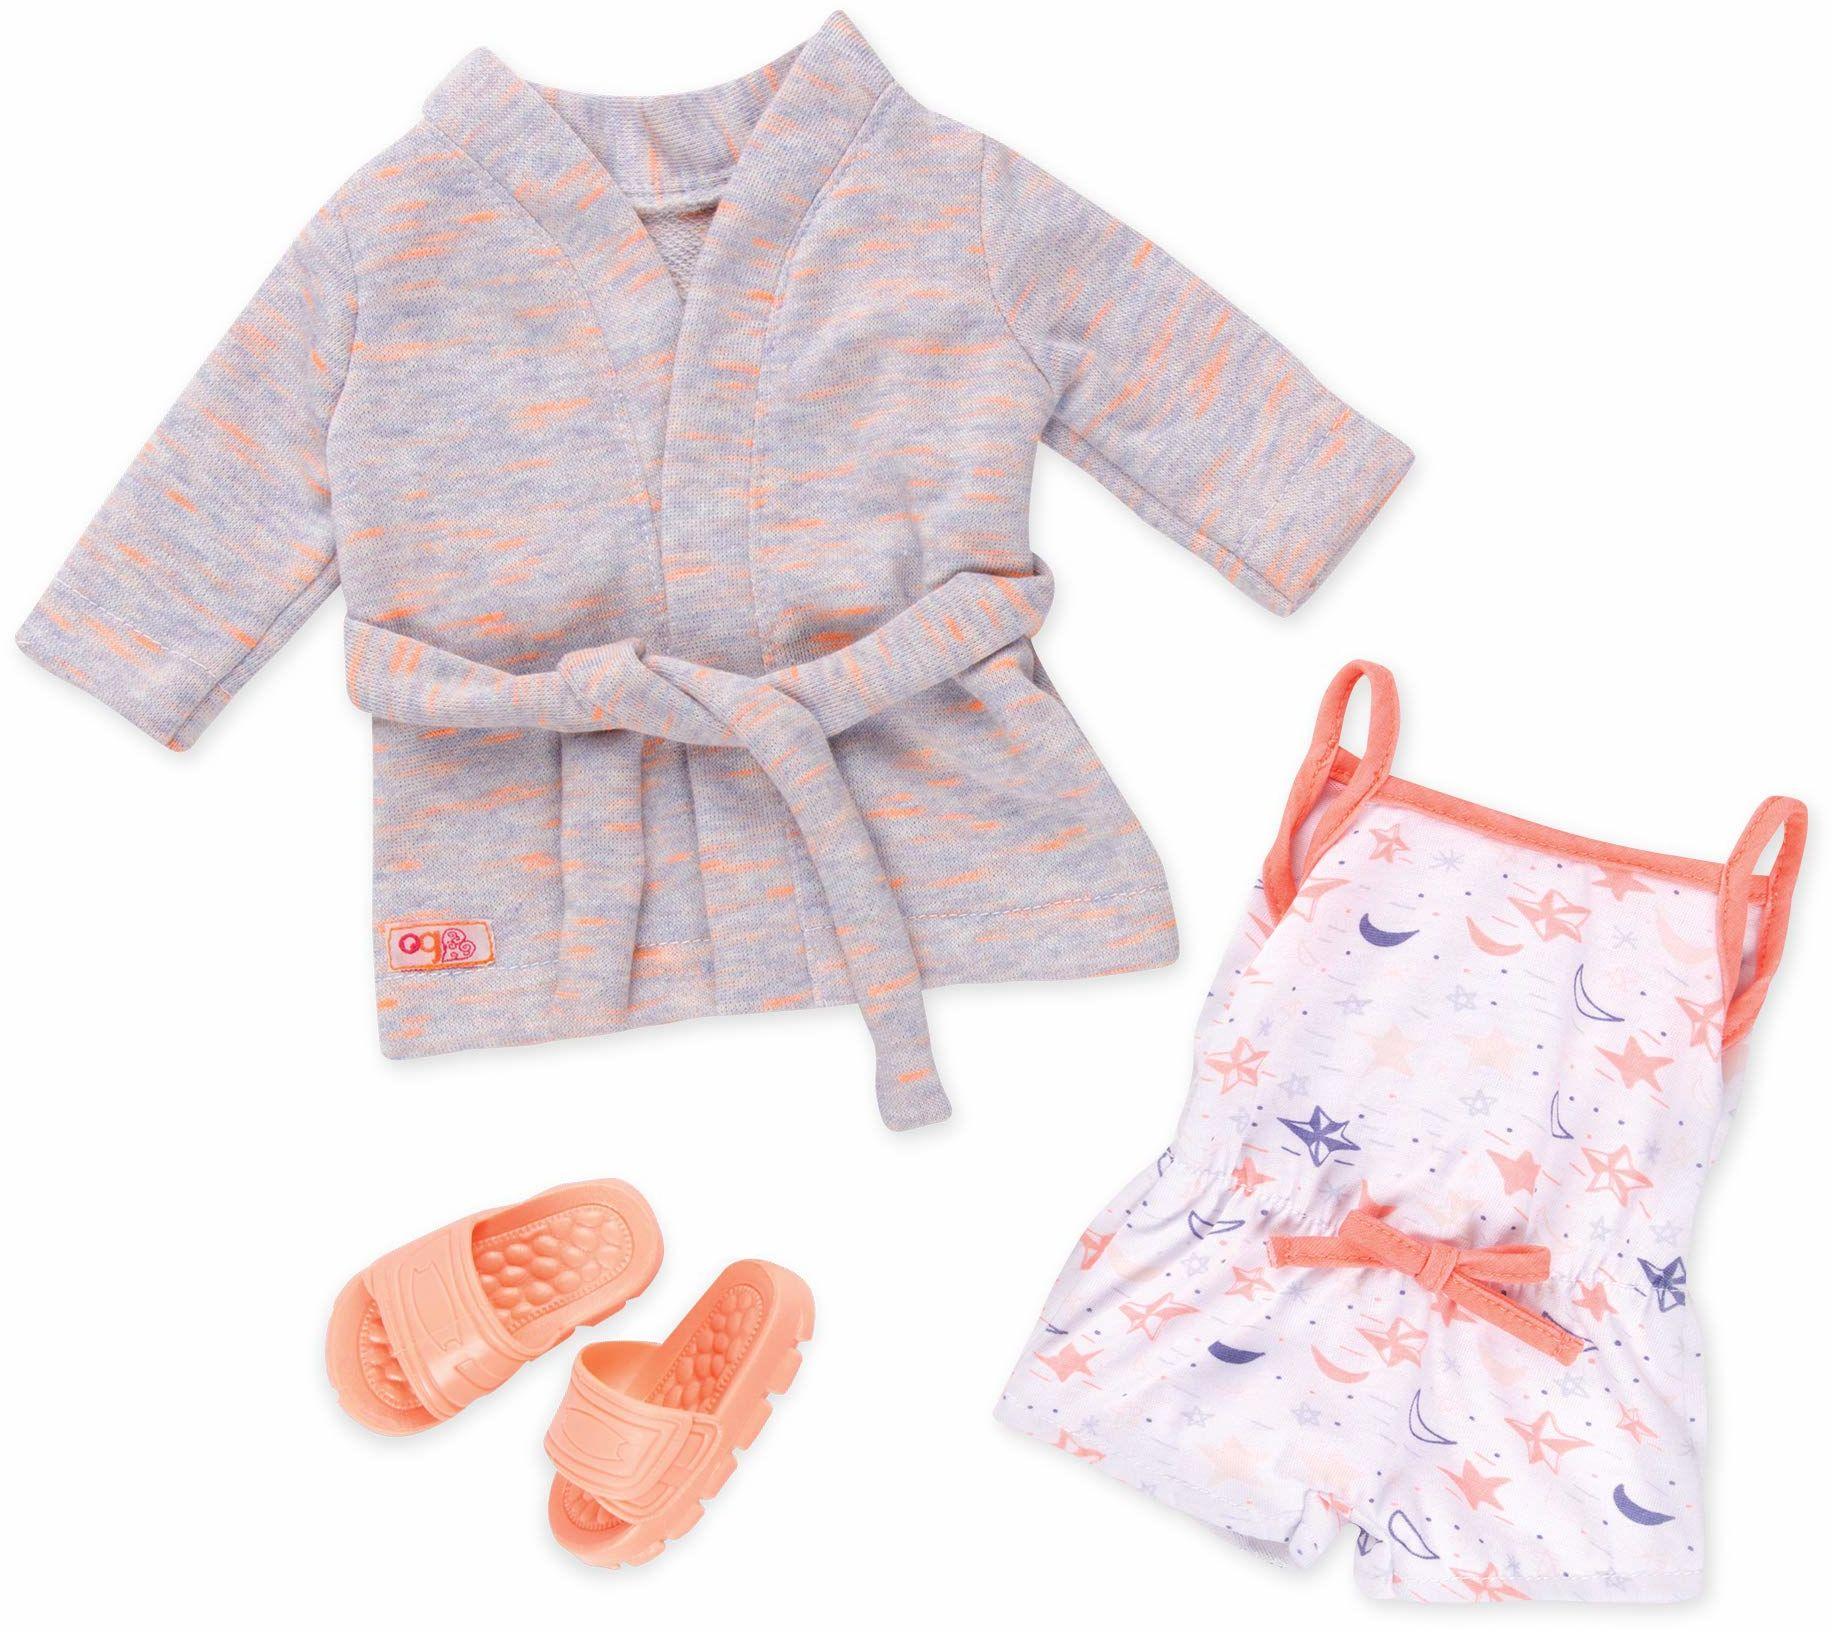 Our Generation BD30292 ''Dream Come True'' piżama z lalką, różne